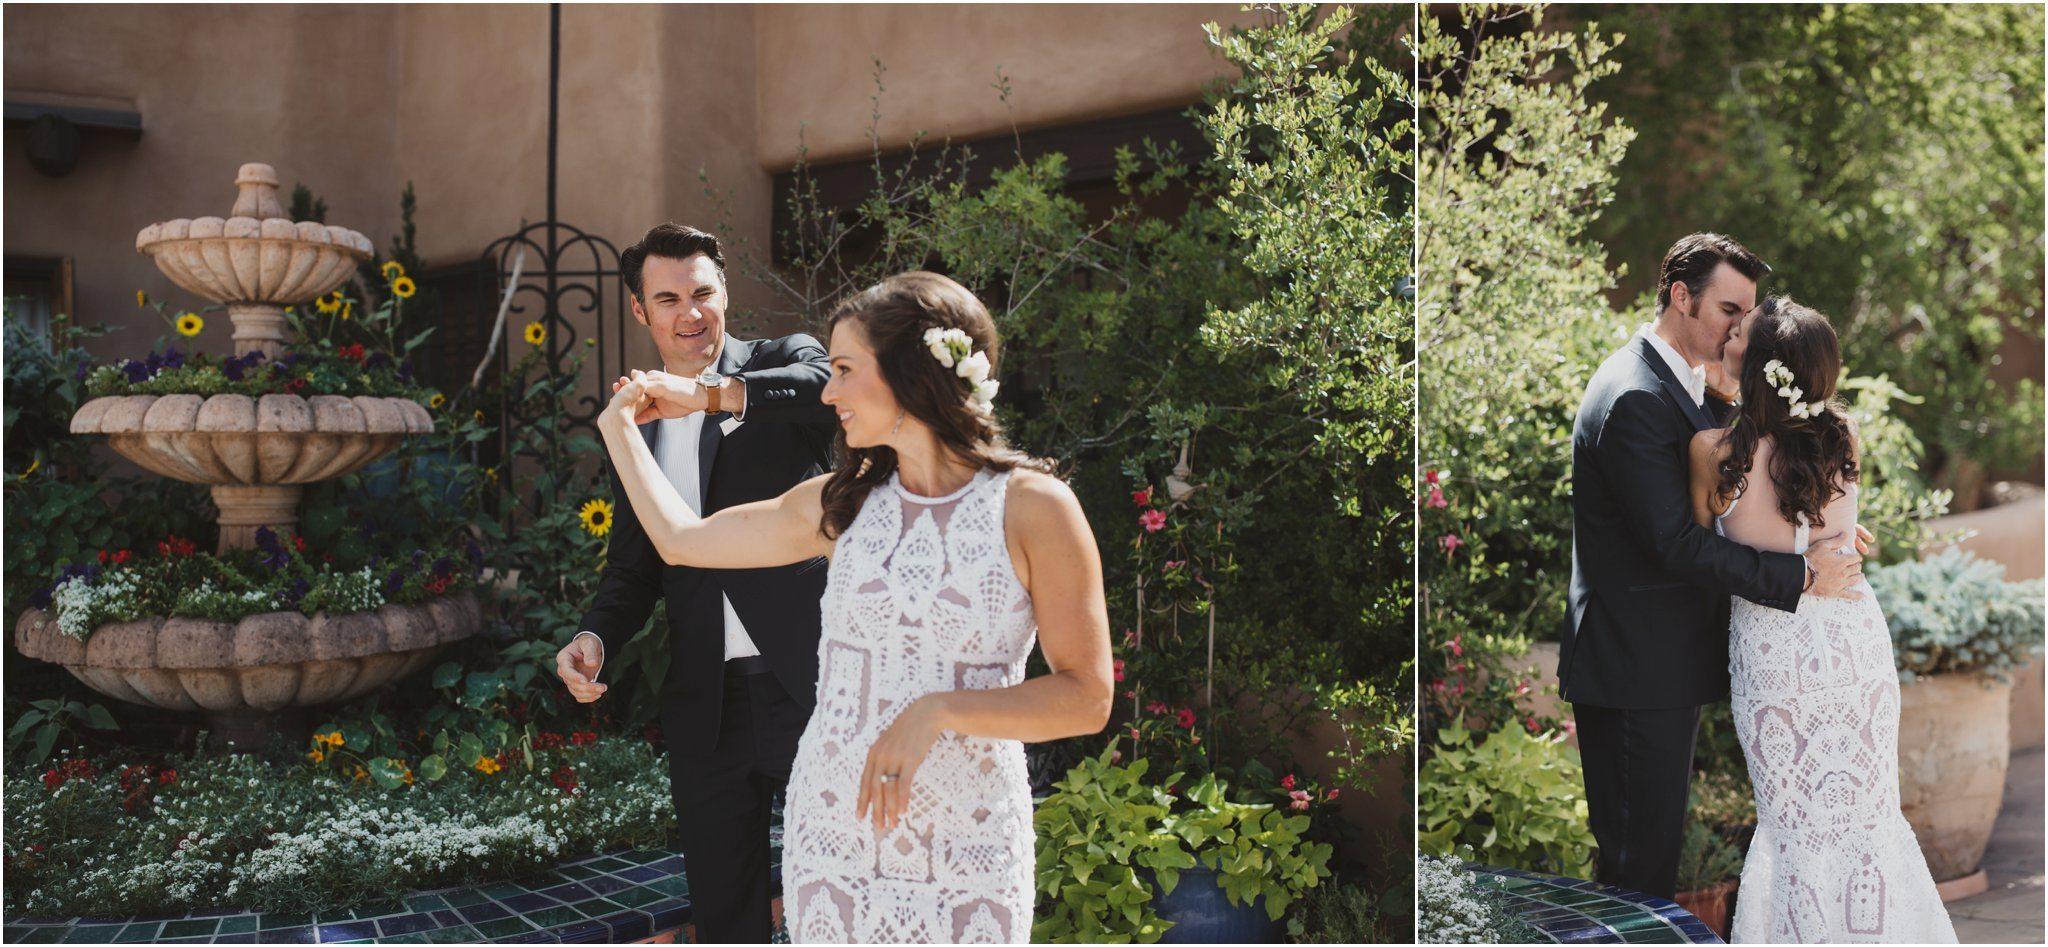 0020santa-fe-wedding-photographer_albuquerque-wedding-photographer_-southwest-wedding-photography_-blue-rose-studio